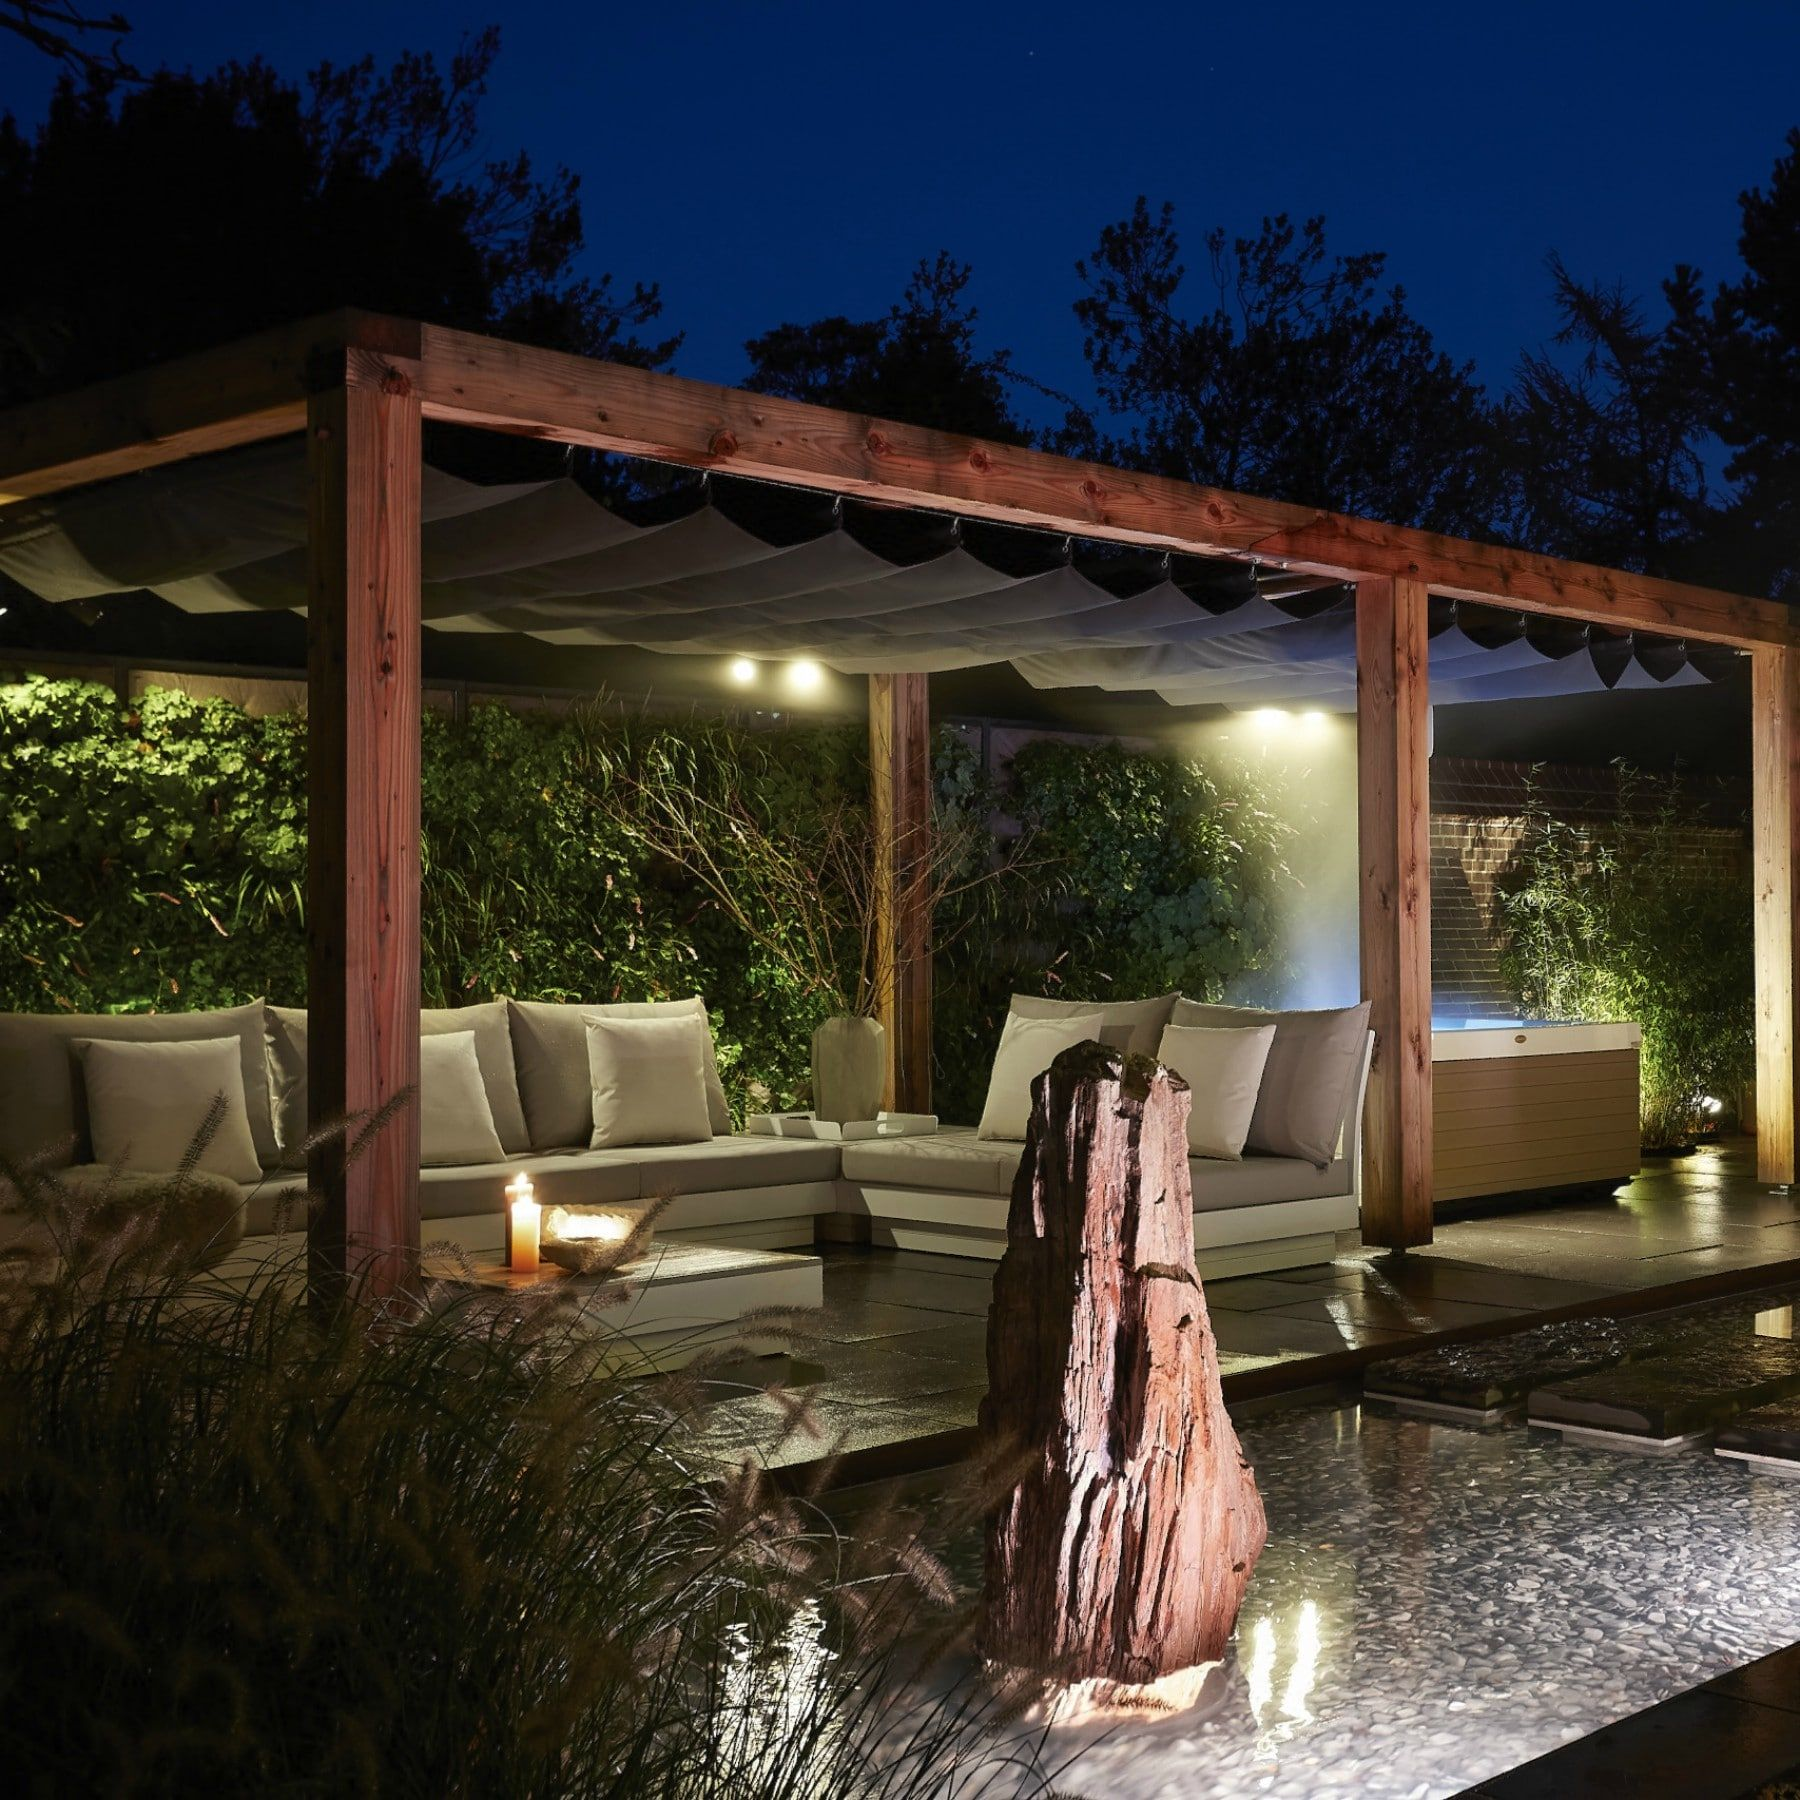 INTERIEUR I BINNENKIJKEN I In balans in 'zen villa' Osiris Hertman